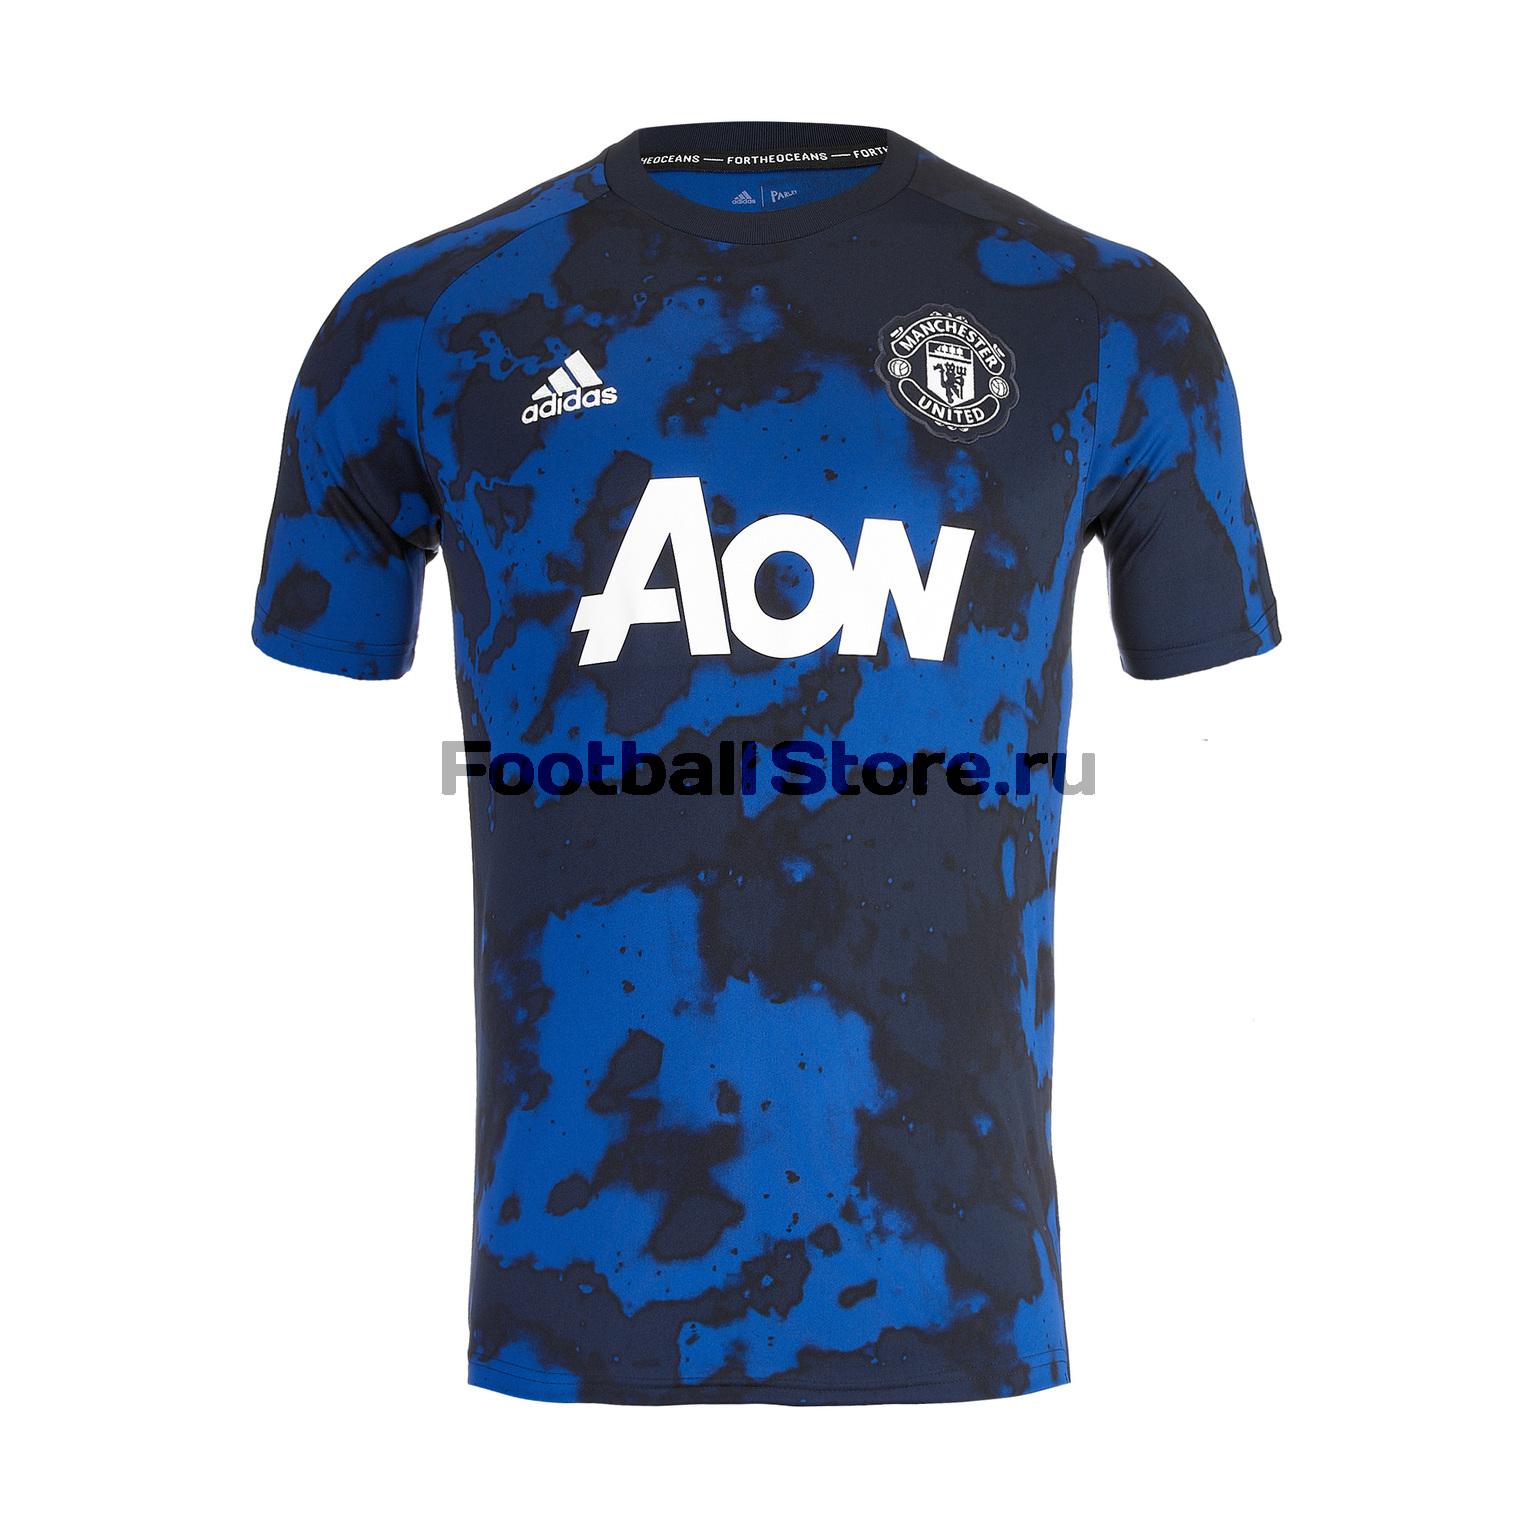 Футболка предыгровая Adidas Manchester United 2019/20 шарф болельщика adidas manchester united scarf cy5578